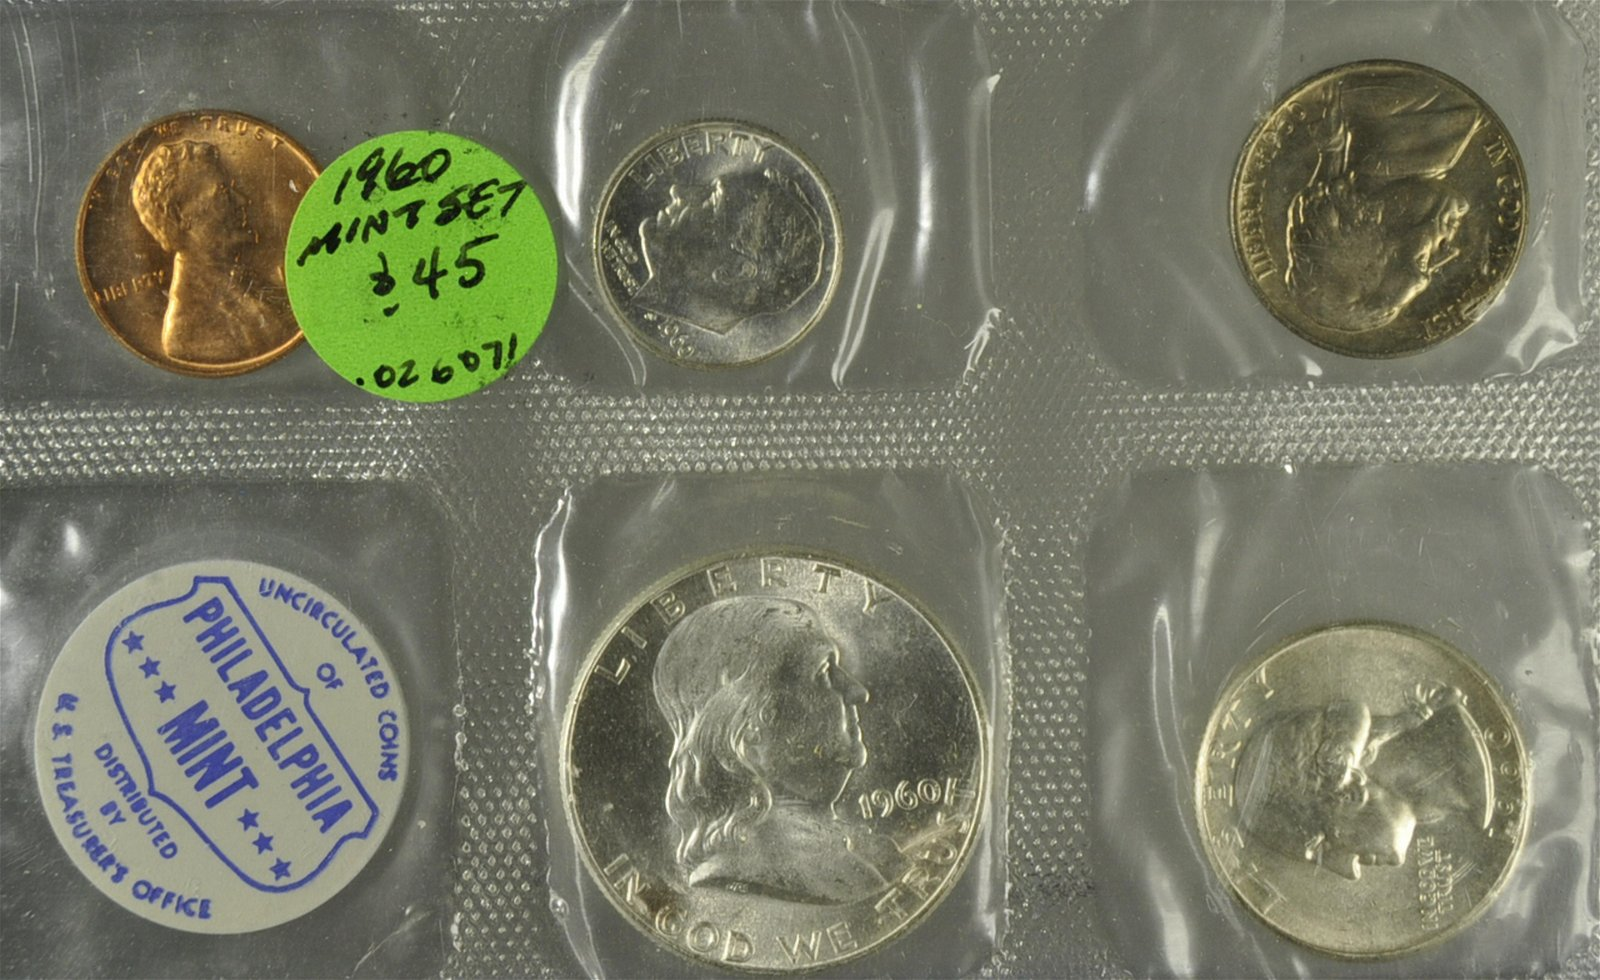 1960 Franklin Mint Set